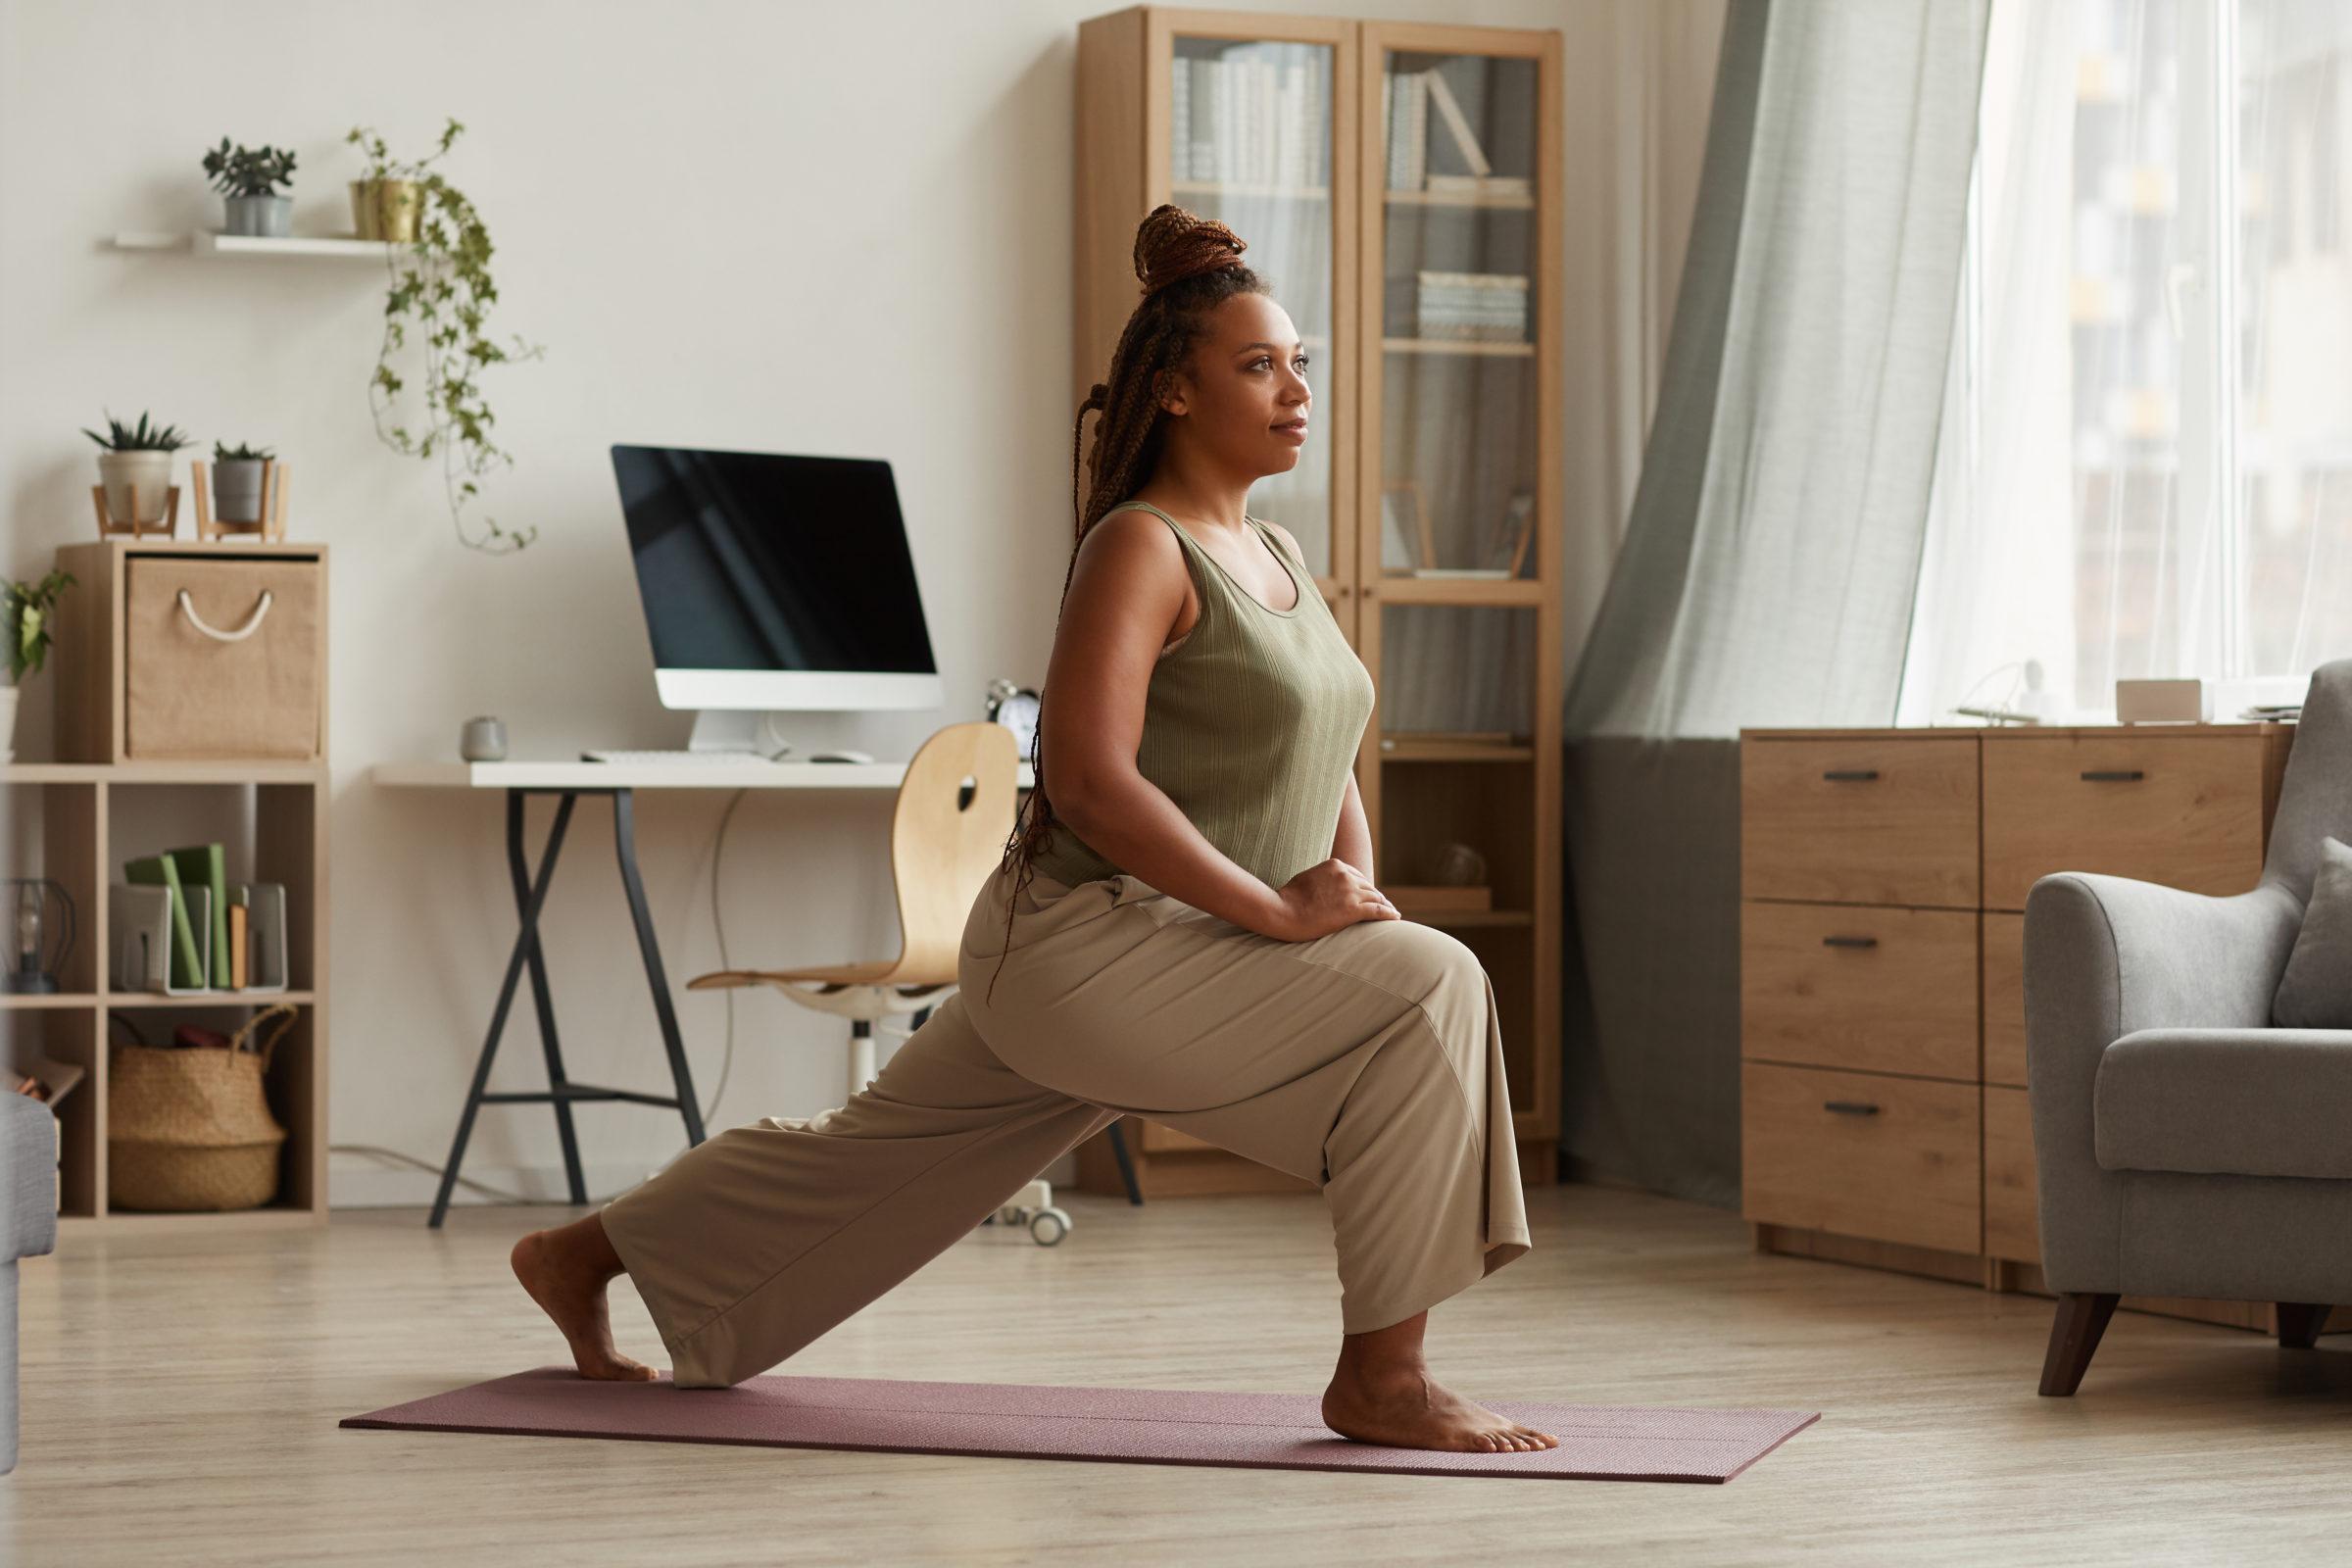 woman exercising on exercise mat QXVVNXR